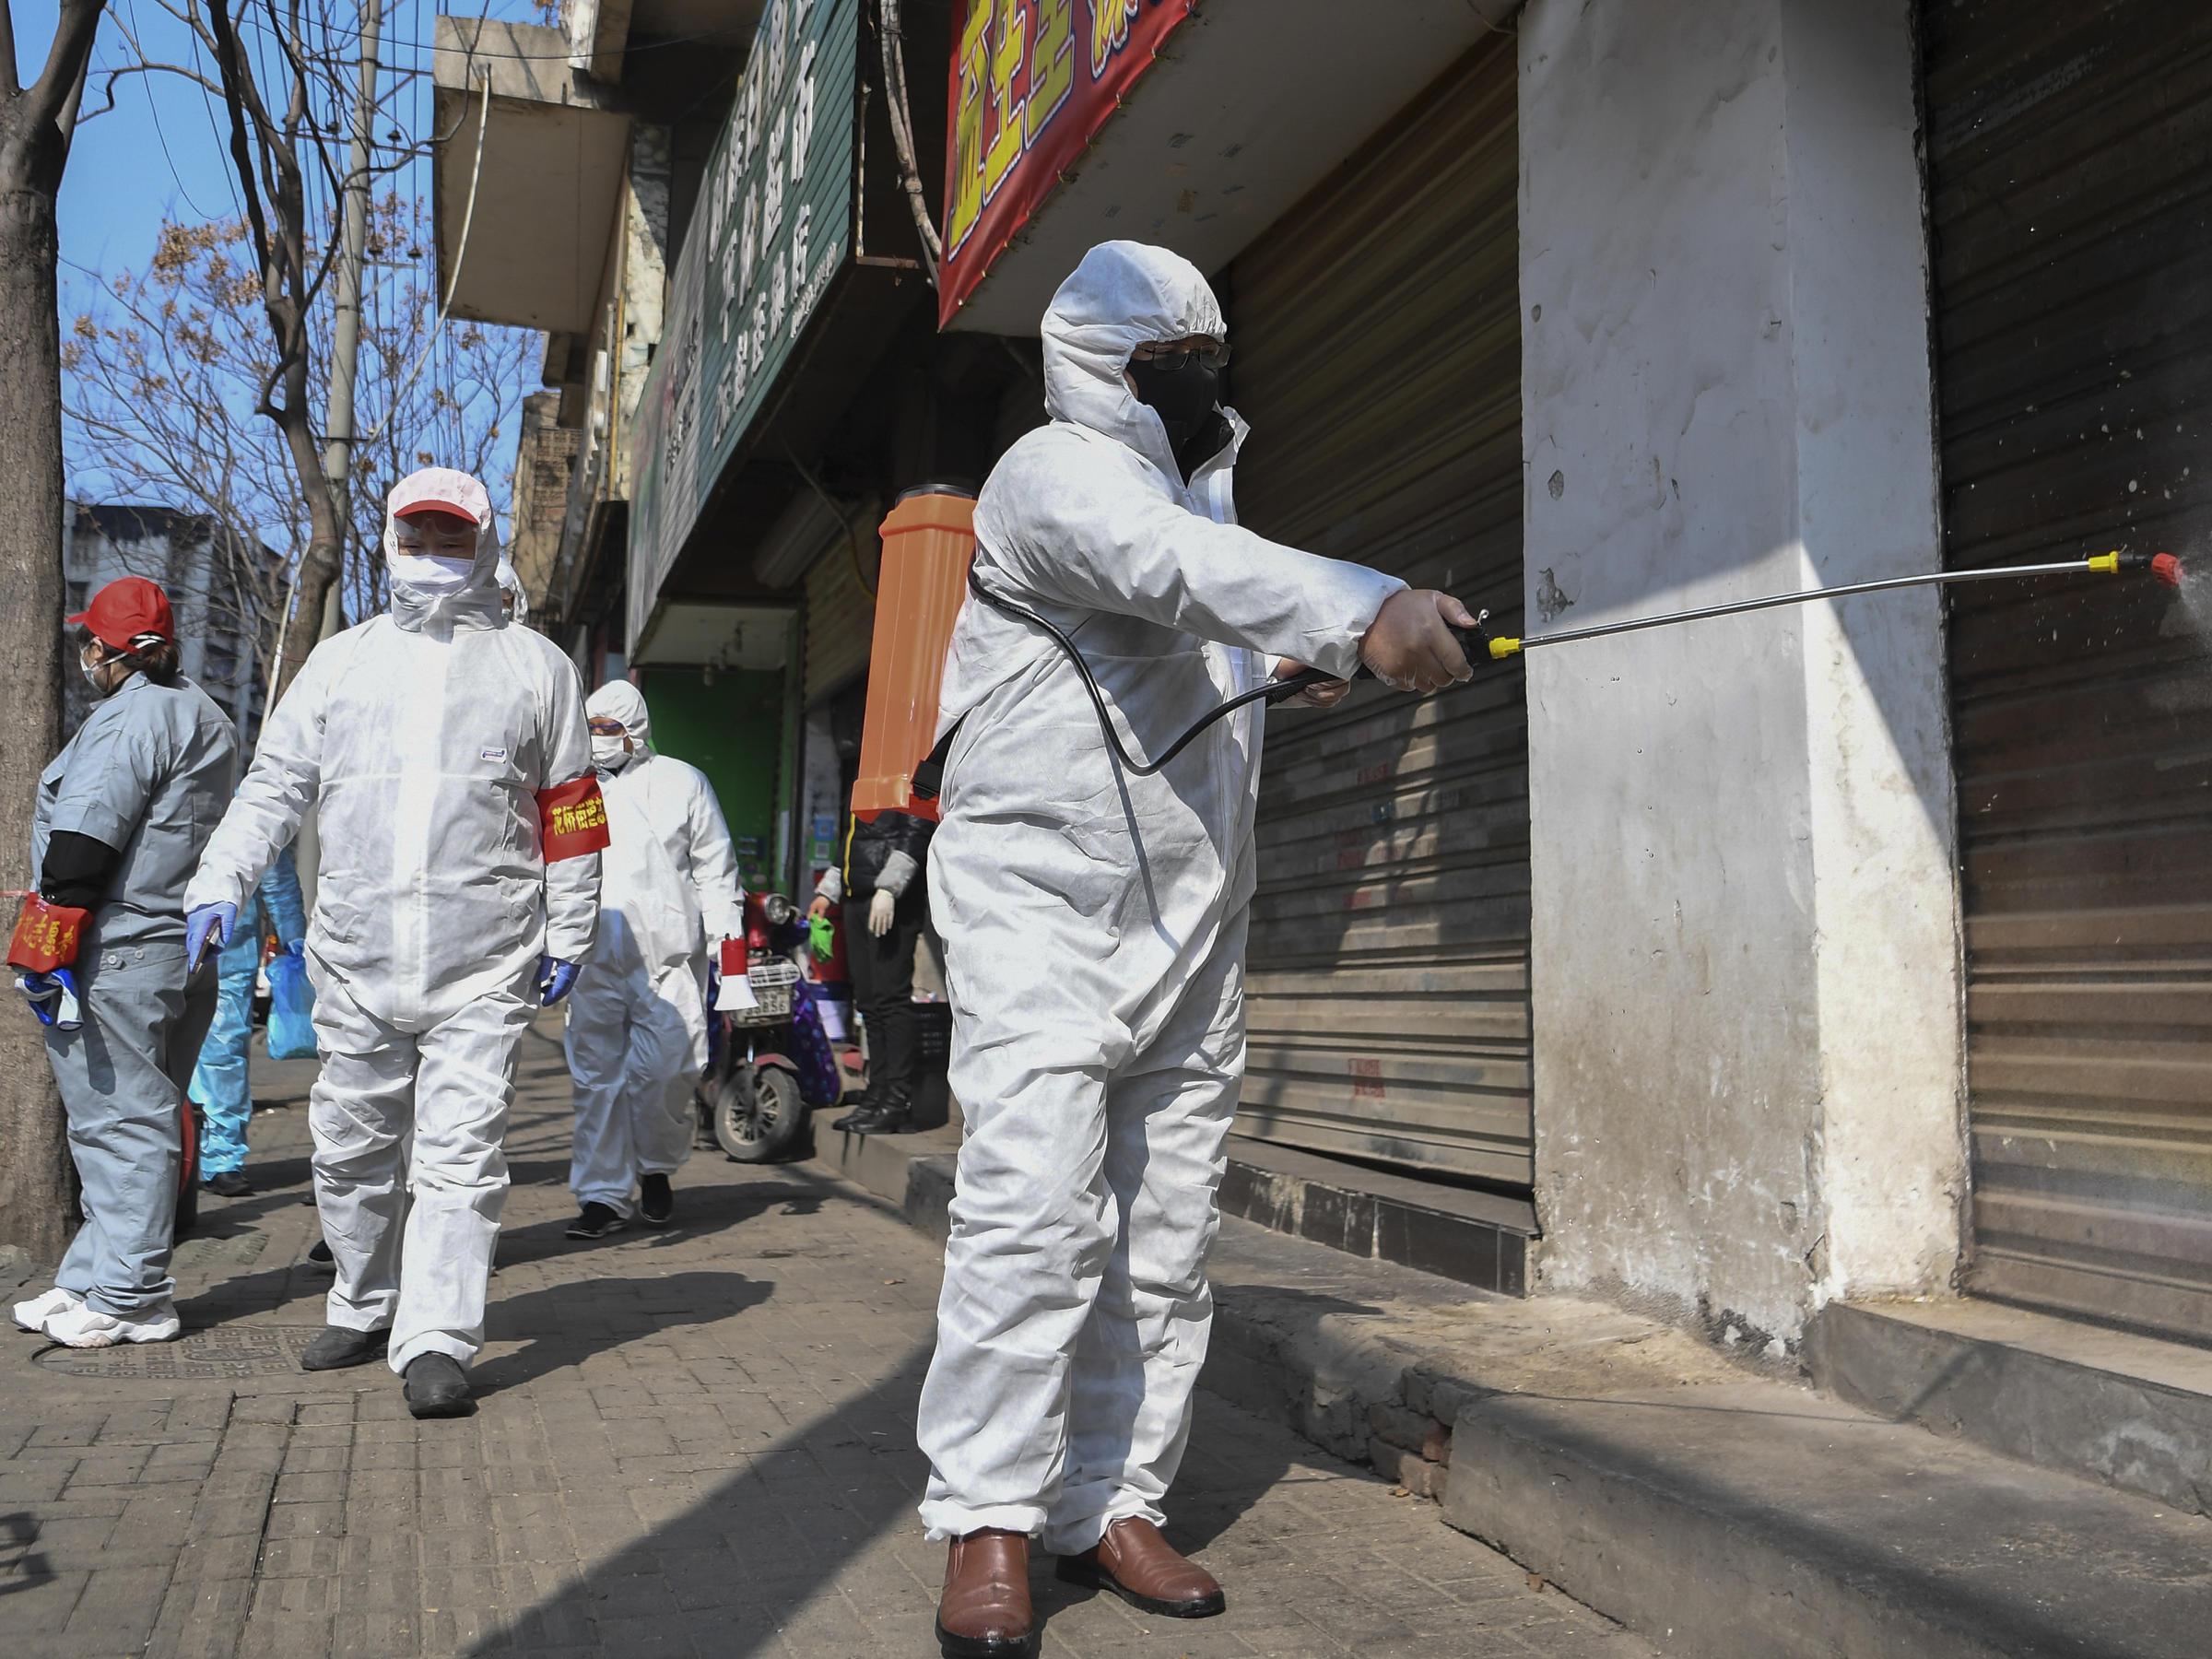 Ireland backs global effort to control coronavirus spread